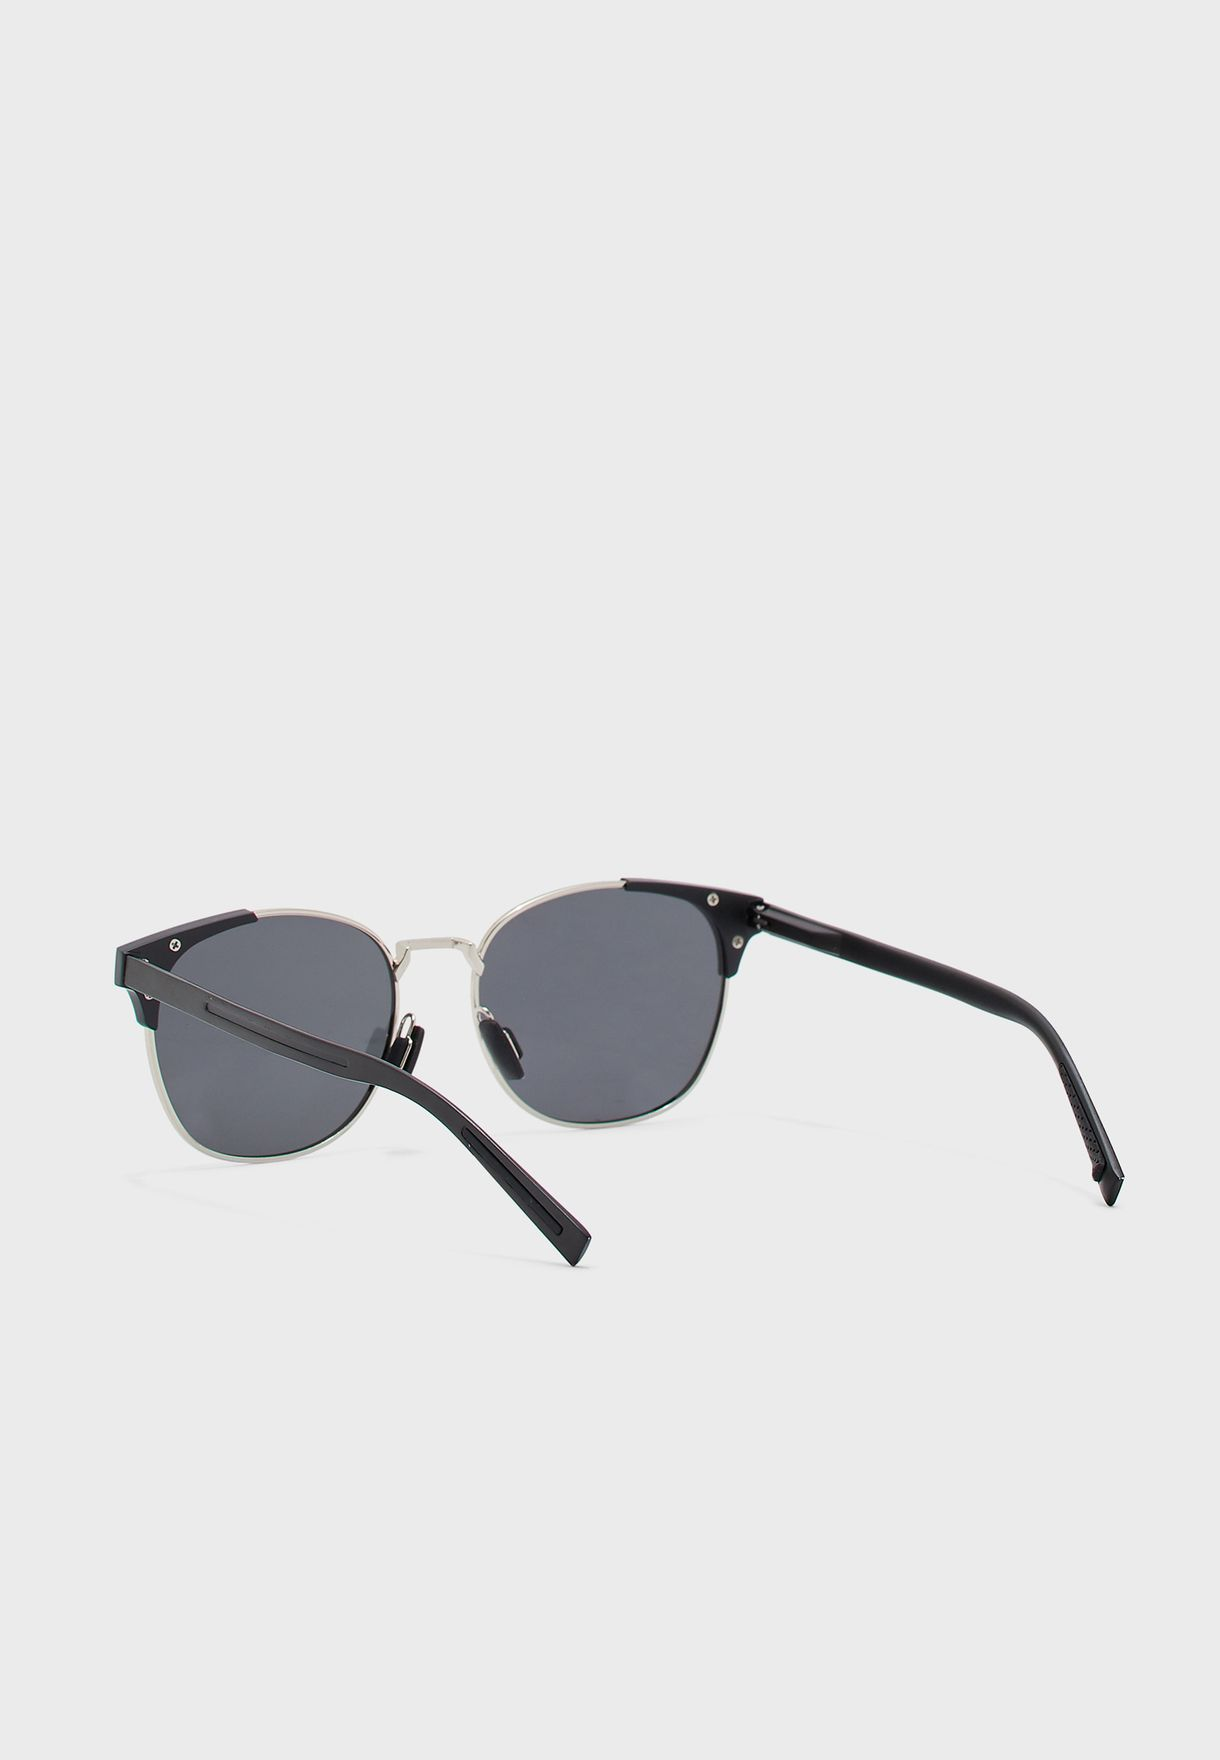 Cateye Clubmaster Sunglasses